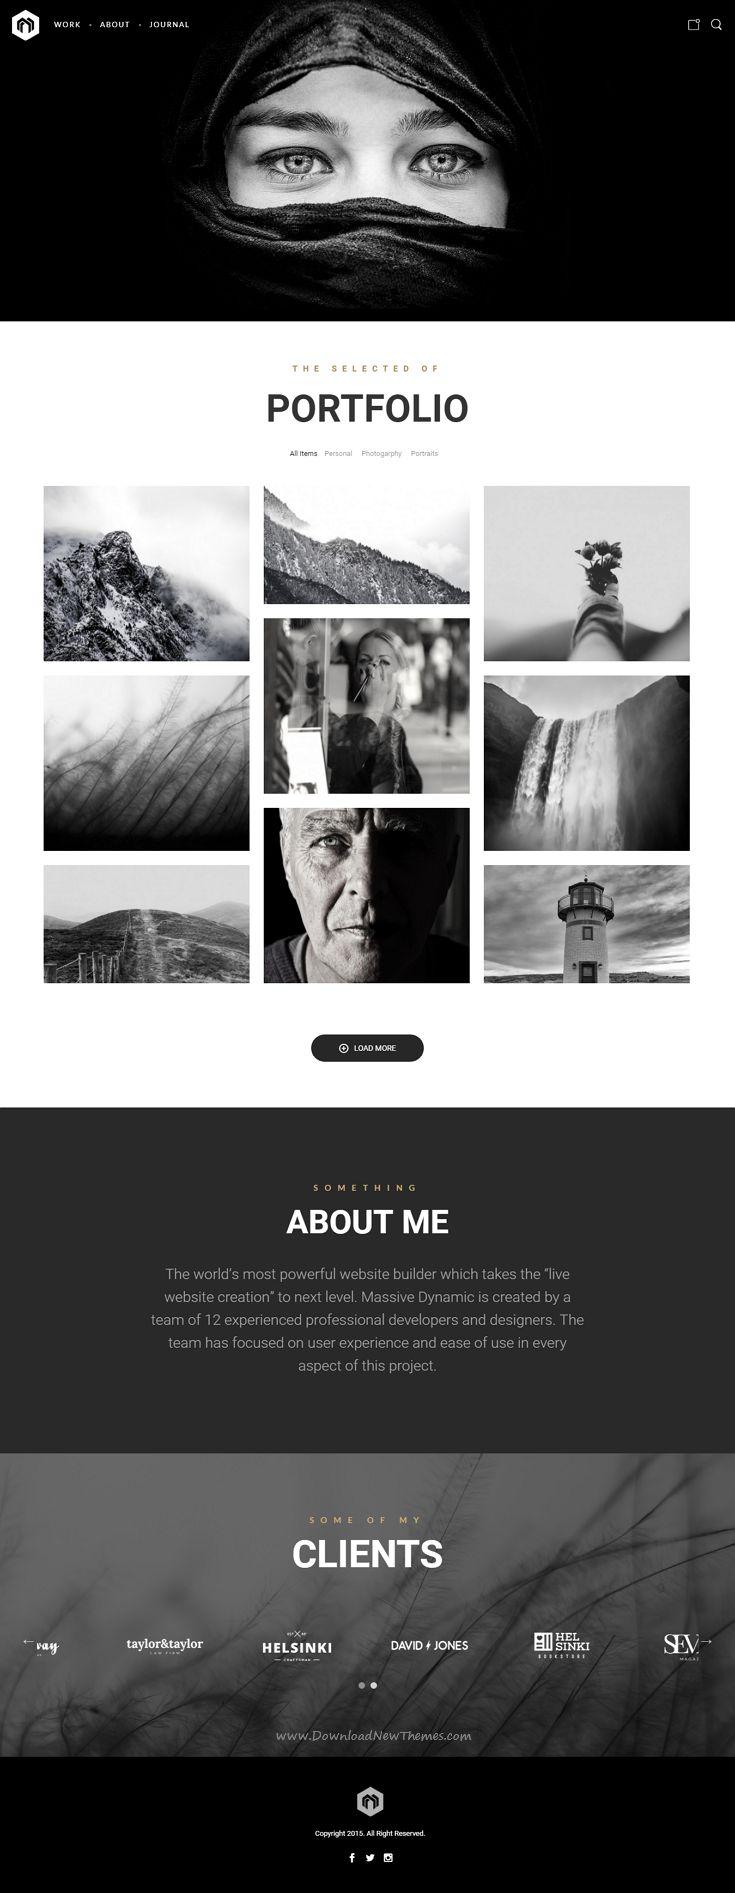 White Background Photography Websites | Background Editing PicsArt